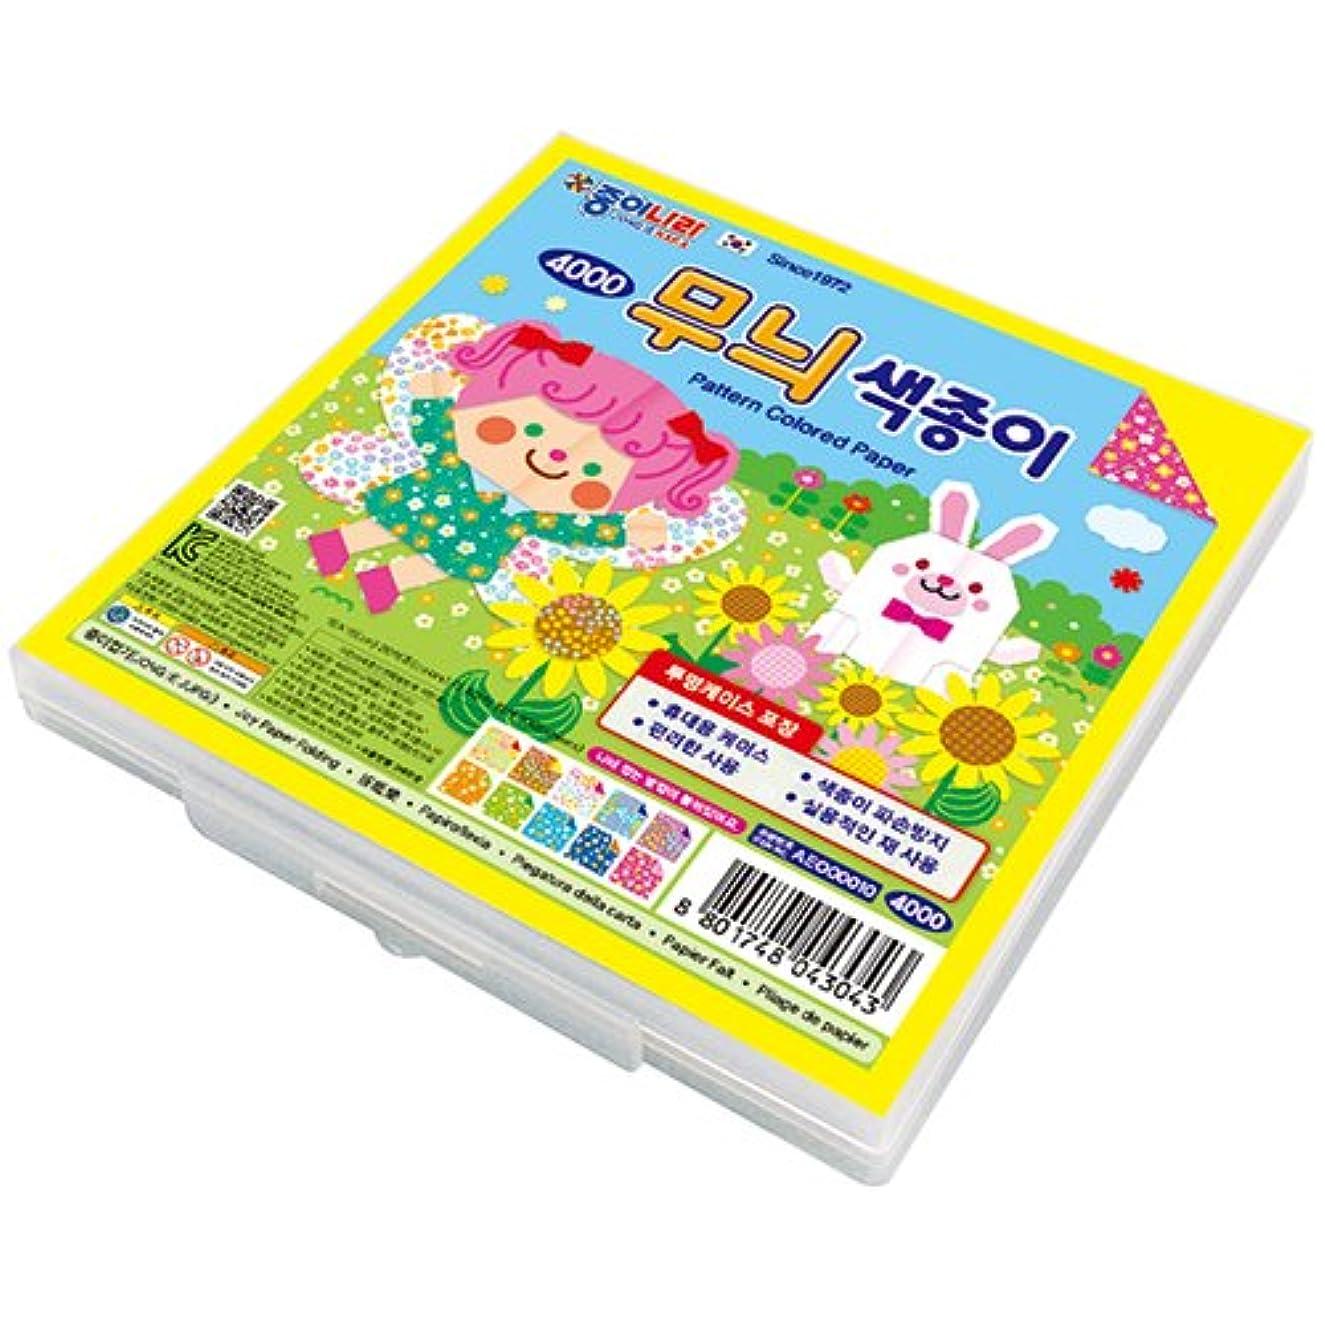 Jong Ie Nara Premium Craft Paper, 5.9